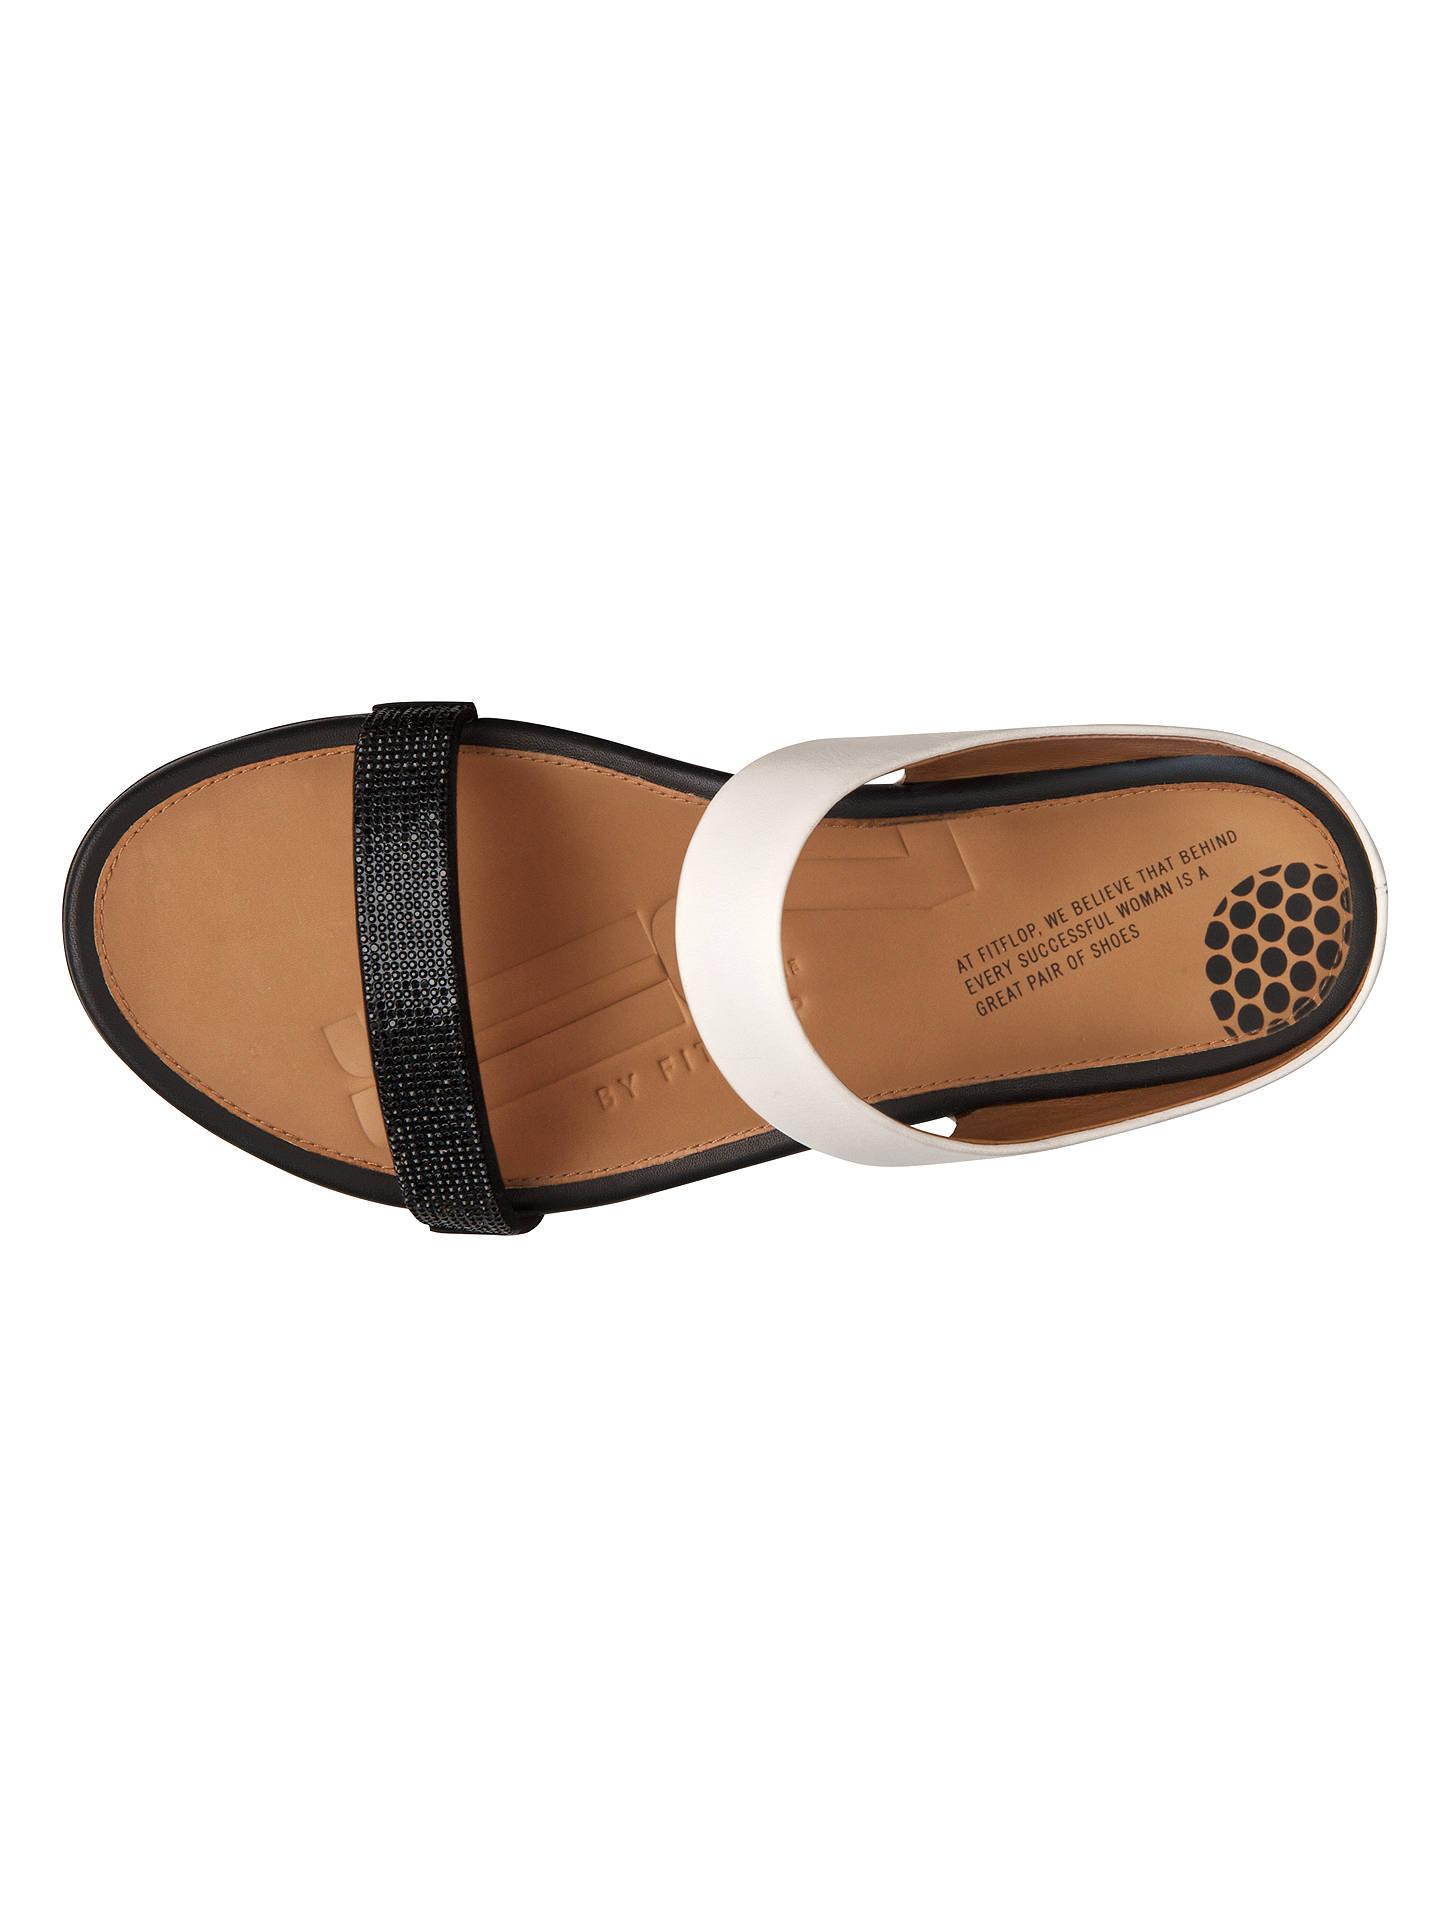 3010448e4 ... Buy FitFlop Banda Crystal Slide Leather Sandals